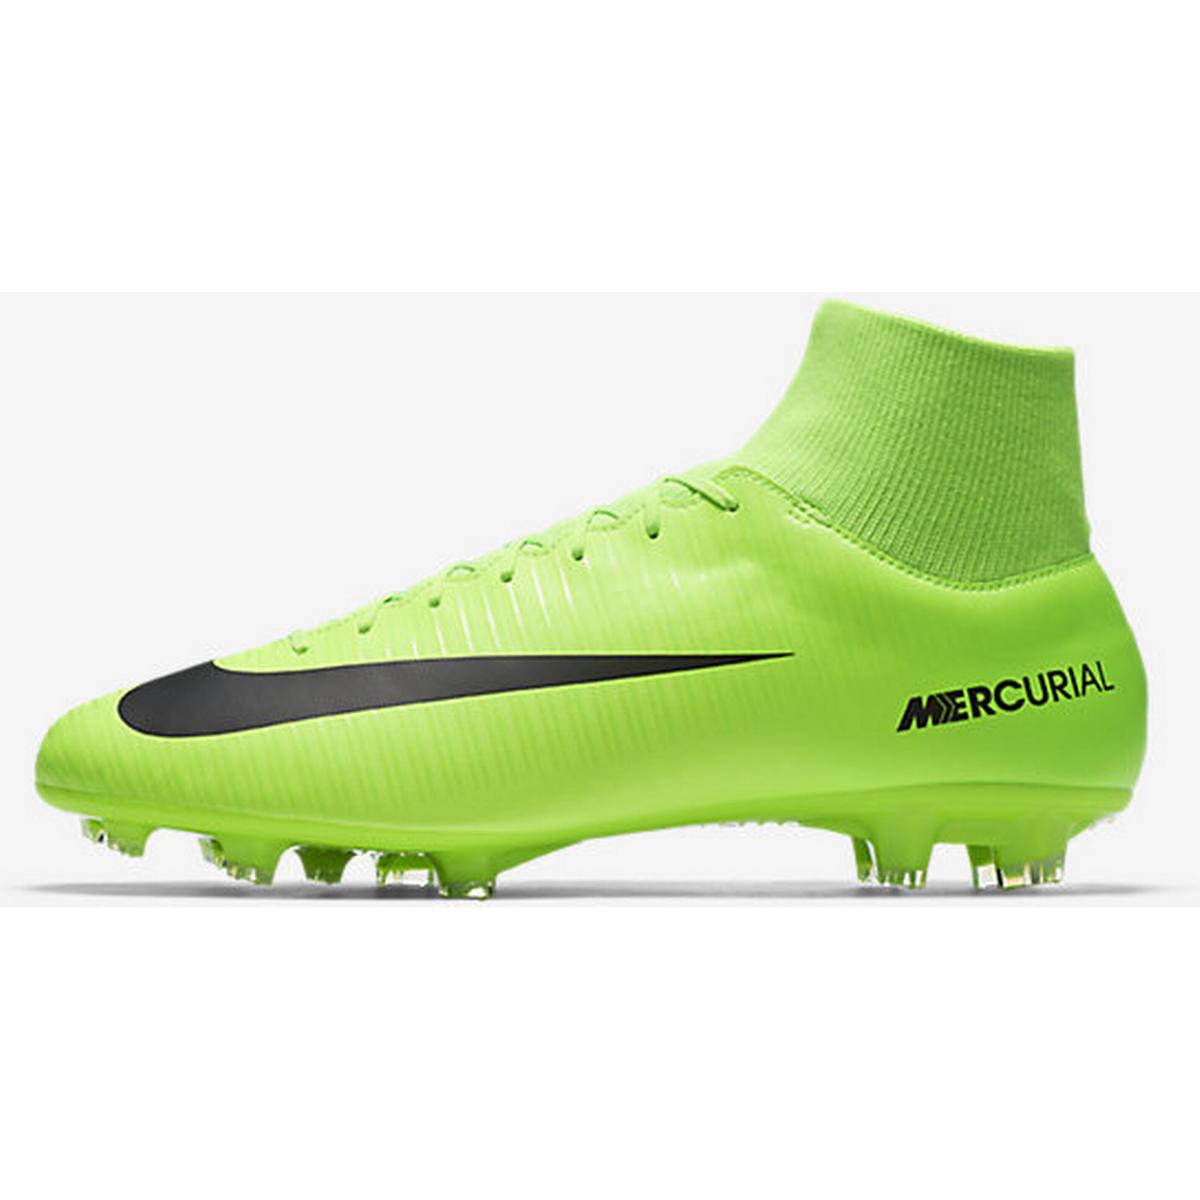 Nike mercurial flyknit • Find den billigste pris hos